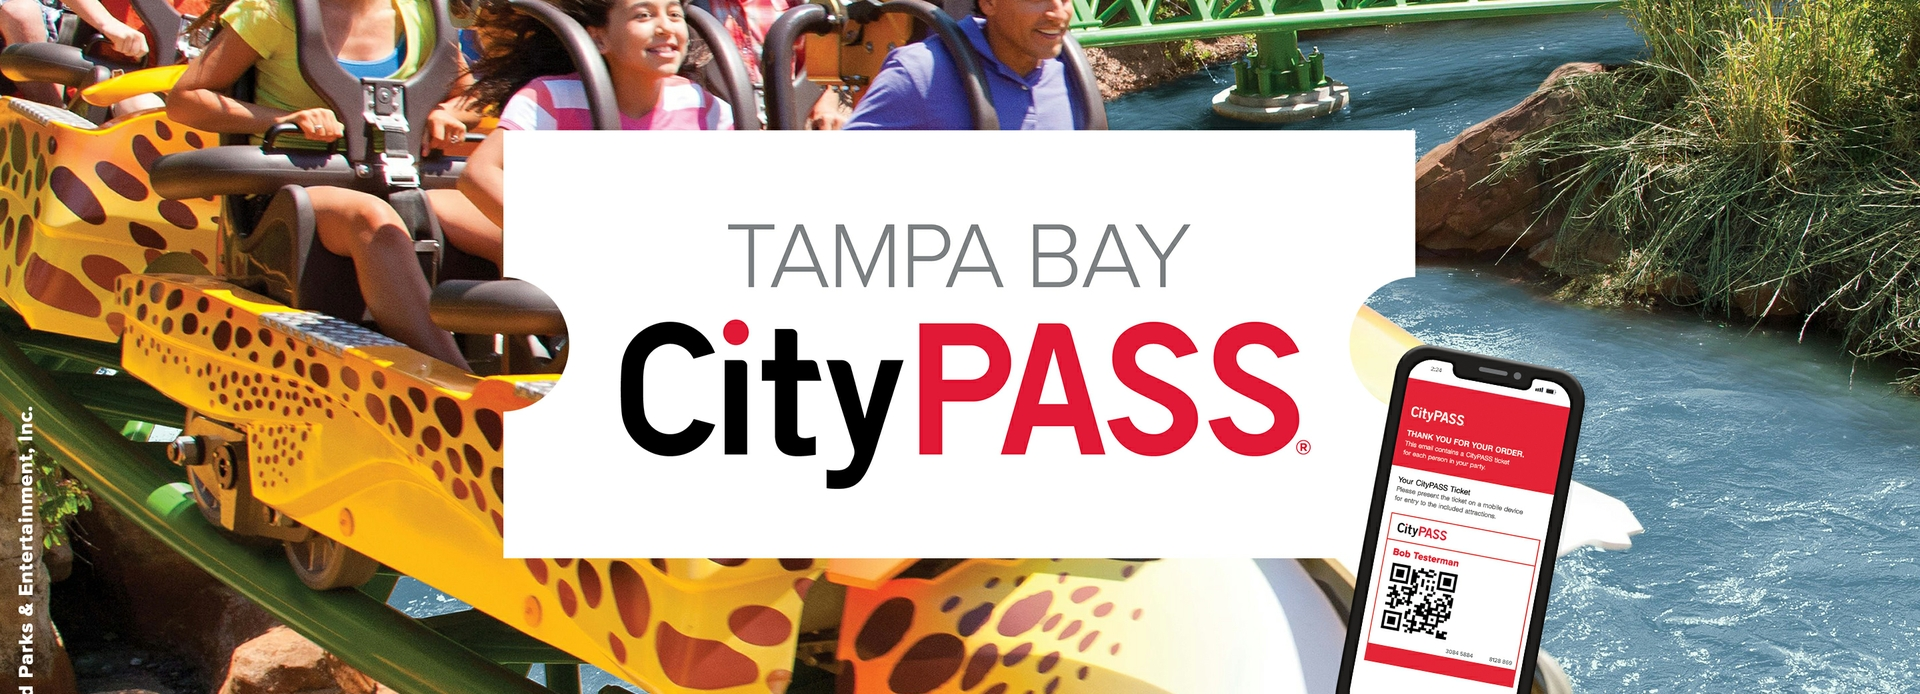 2021-2022 Tampa Bay CityPASS®